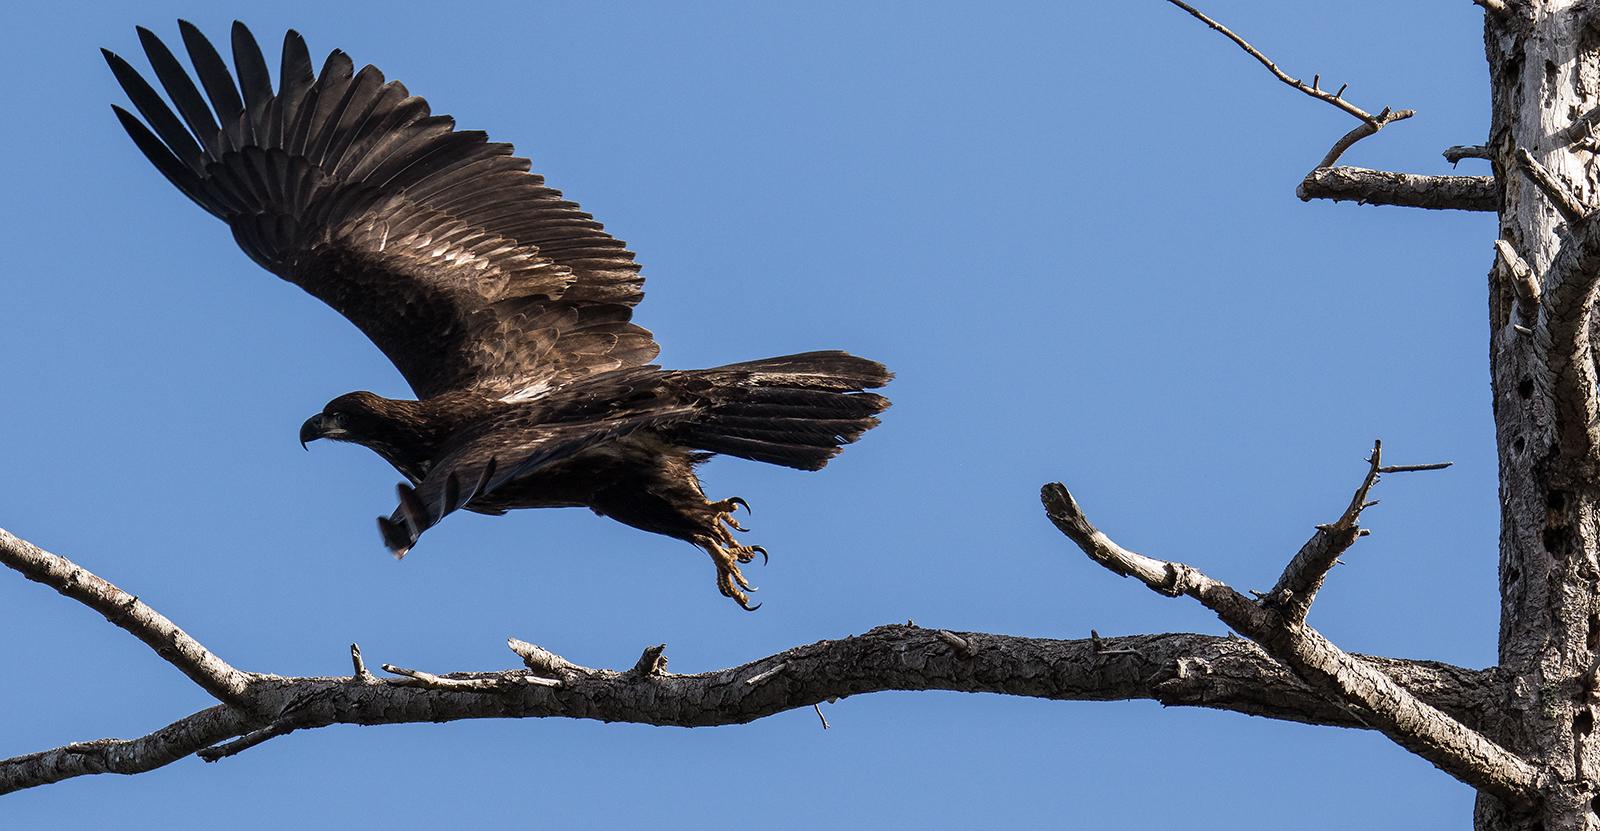 A Juvenile Bald Eagle goes back for seconds